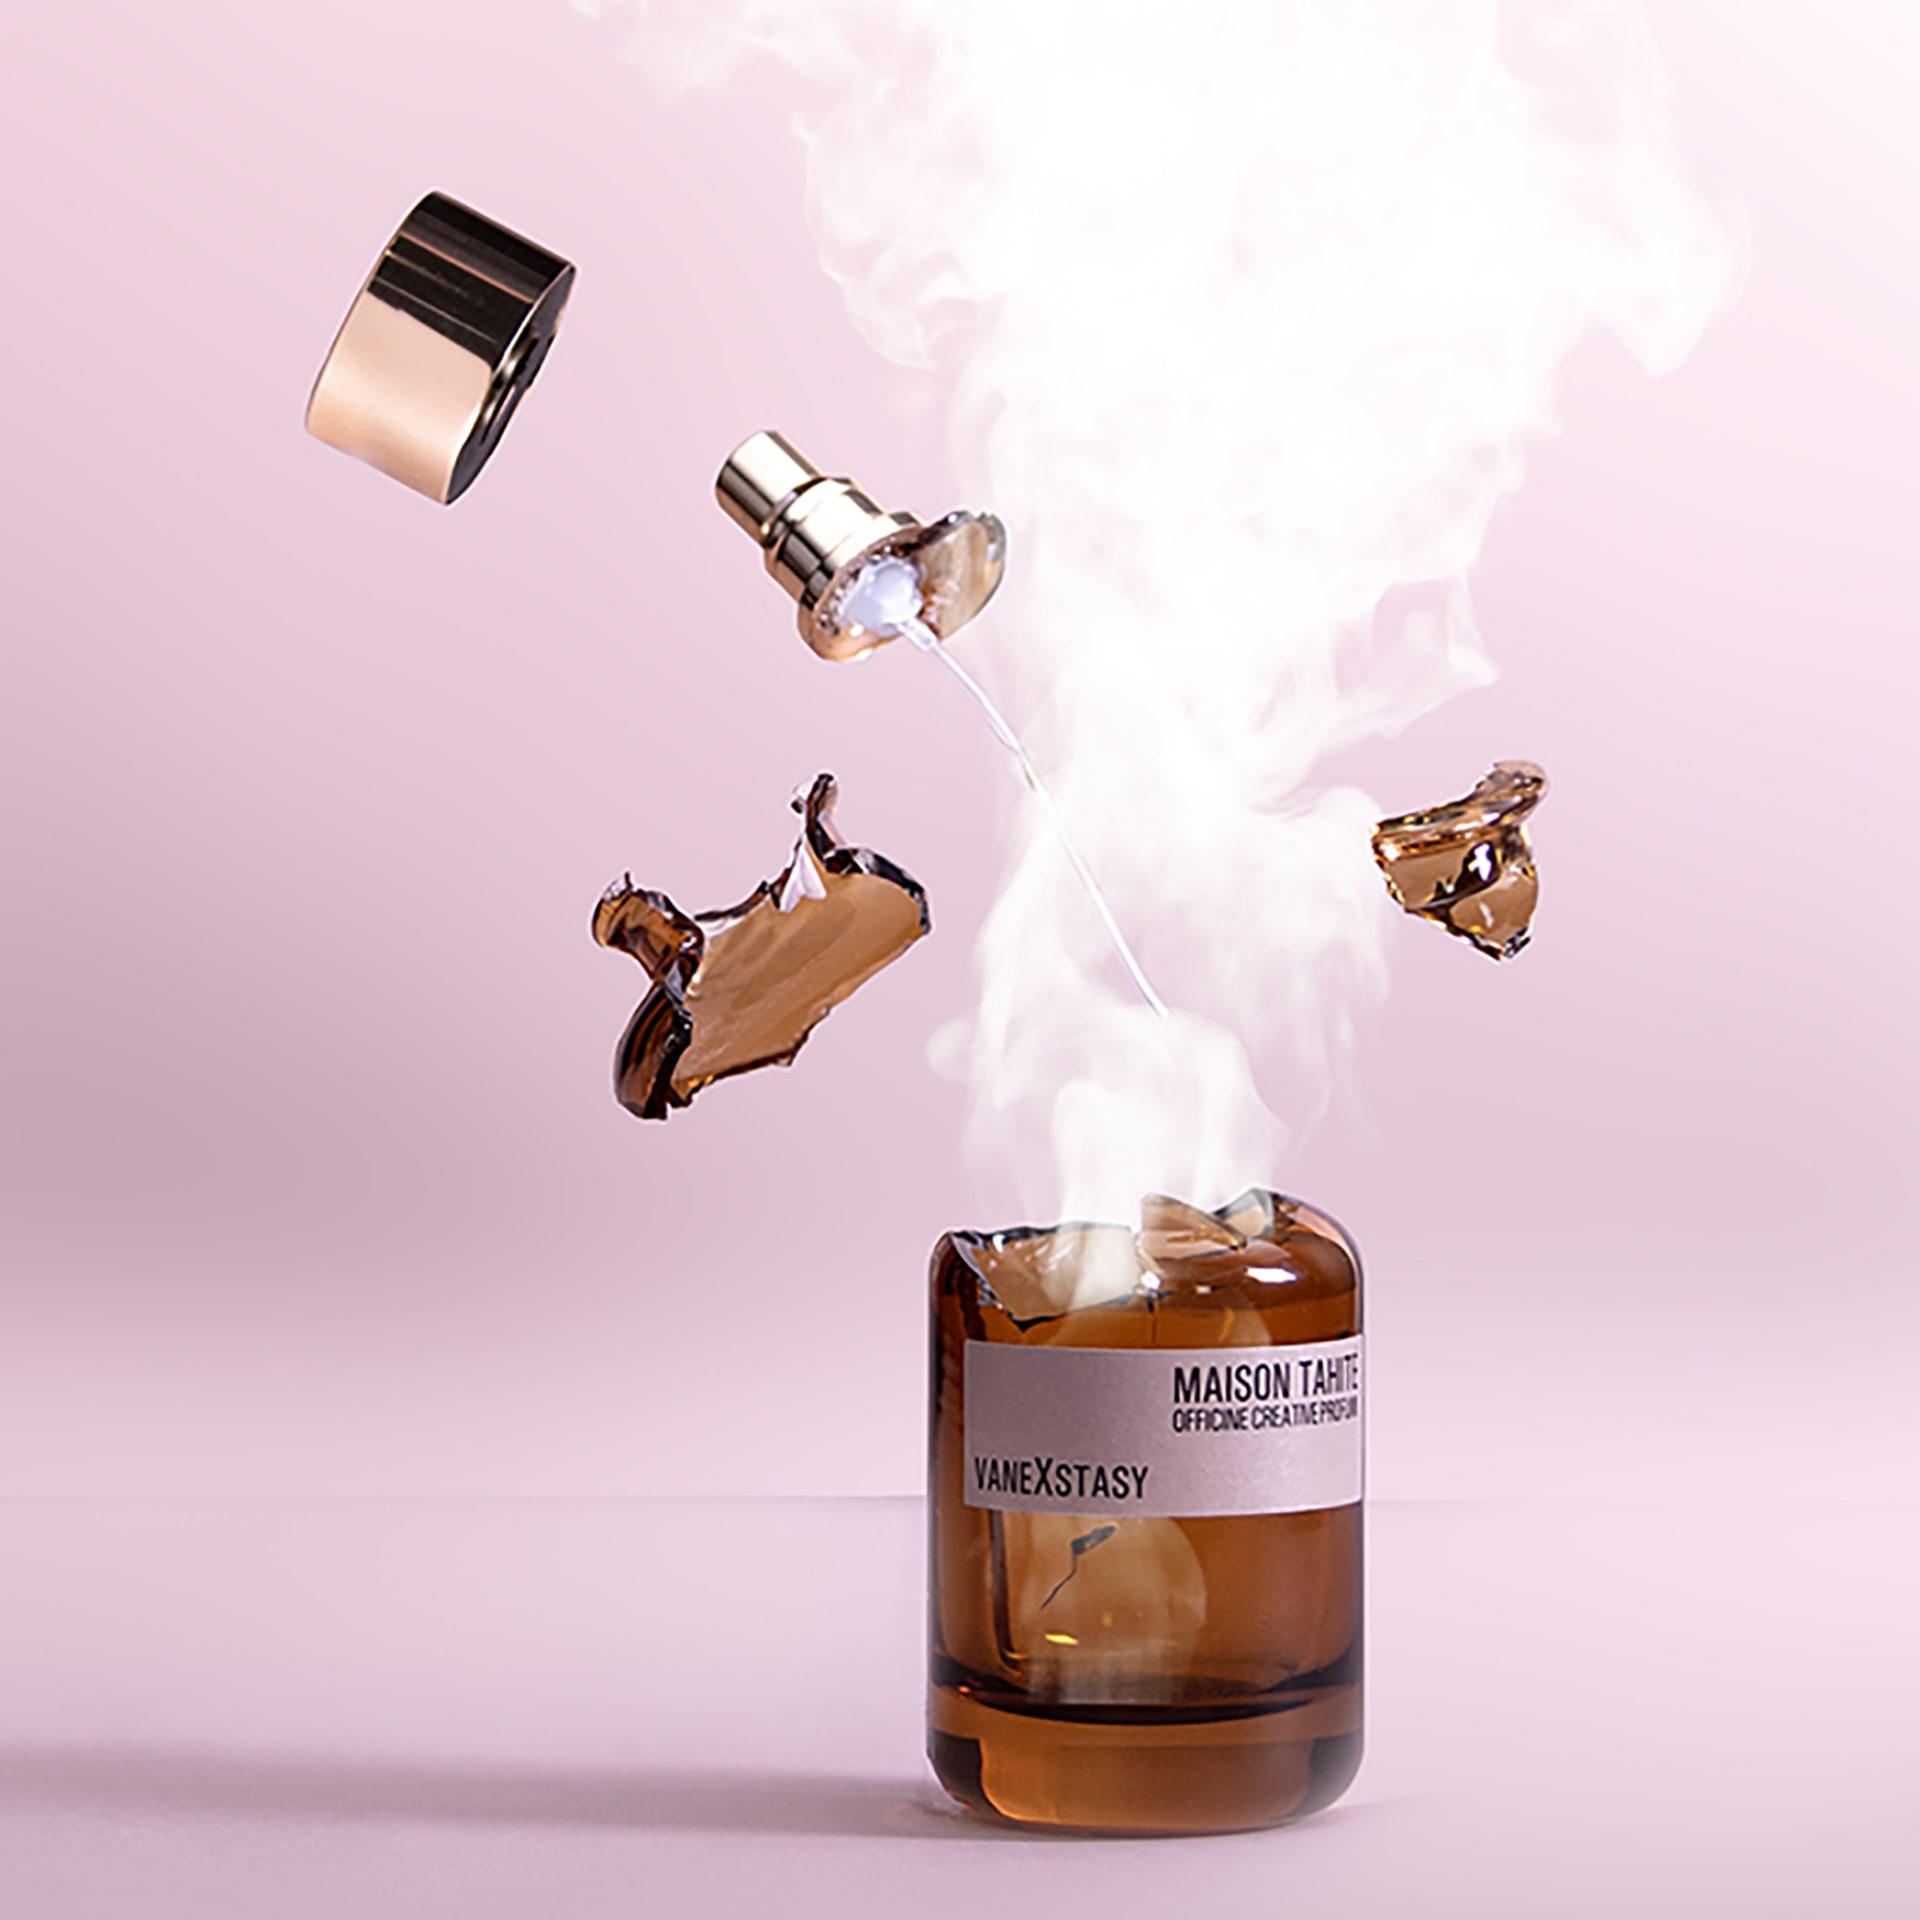 maison-tahite-vanextasy-3